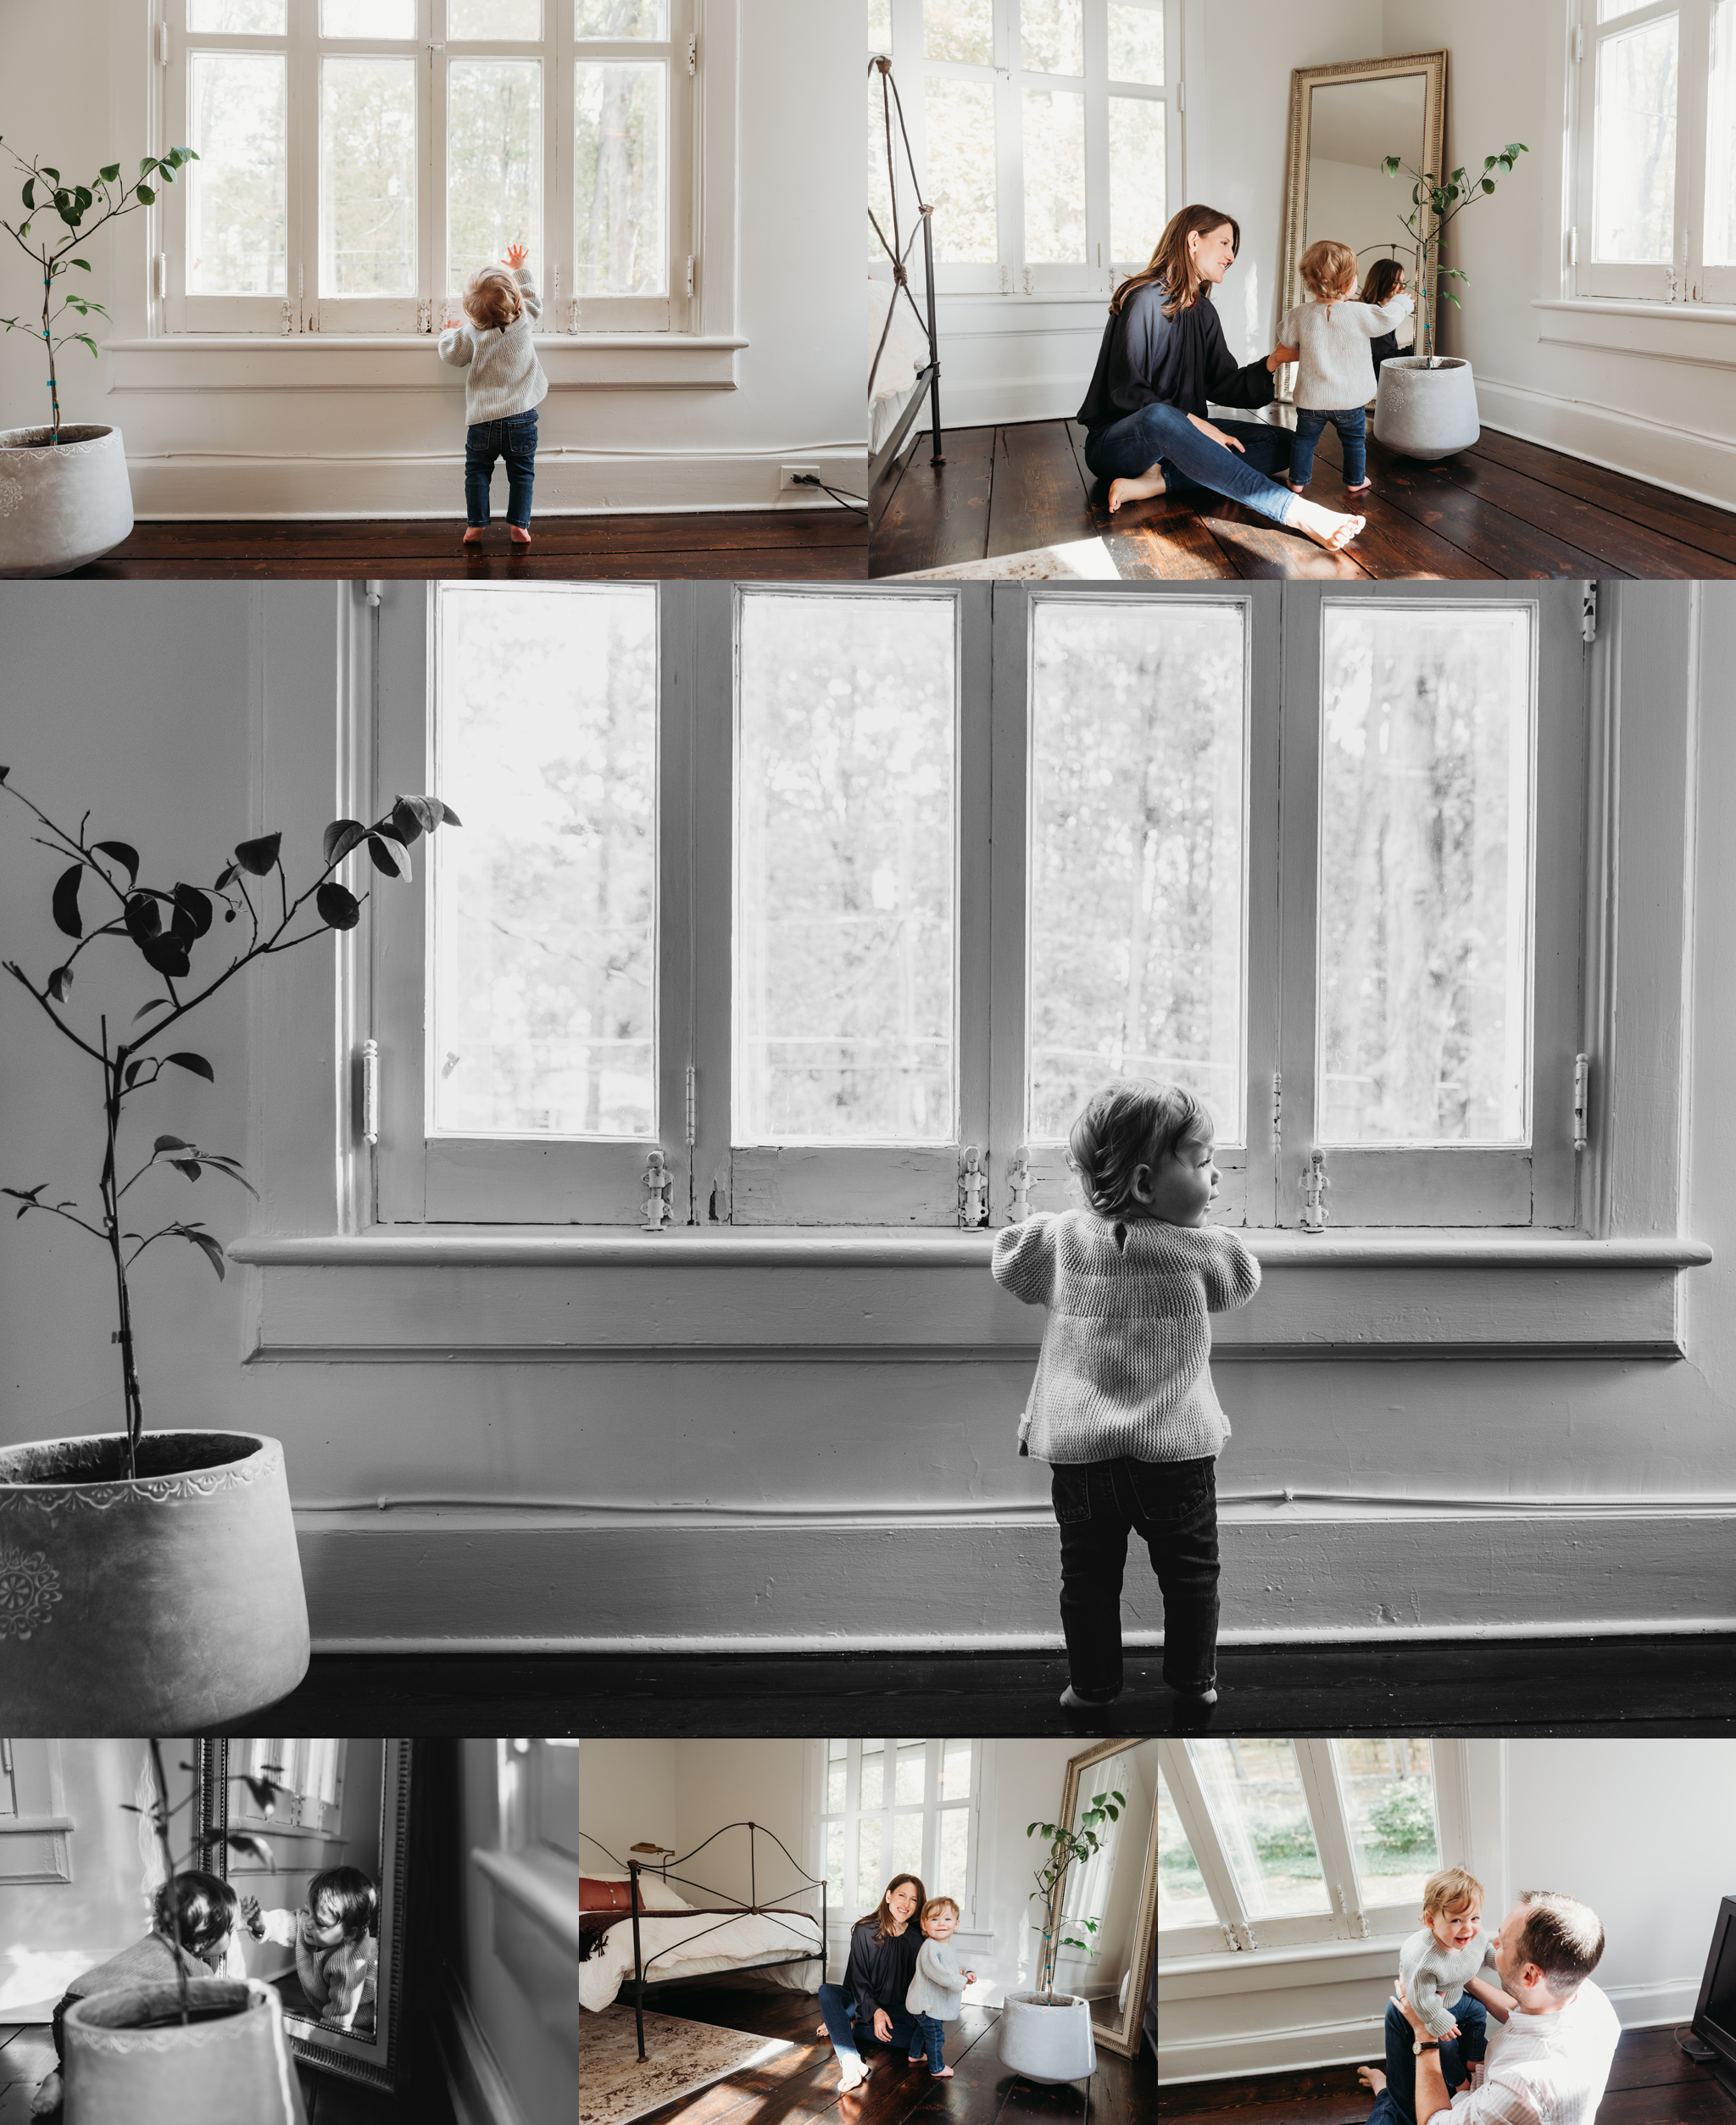 westchester-NY-lifestyle-family-photography6.jpg